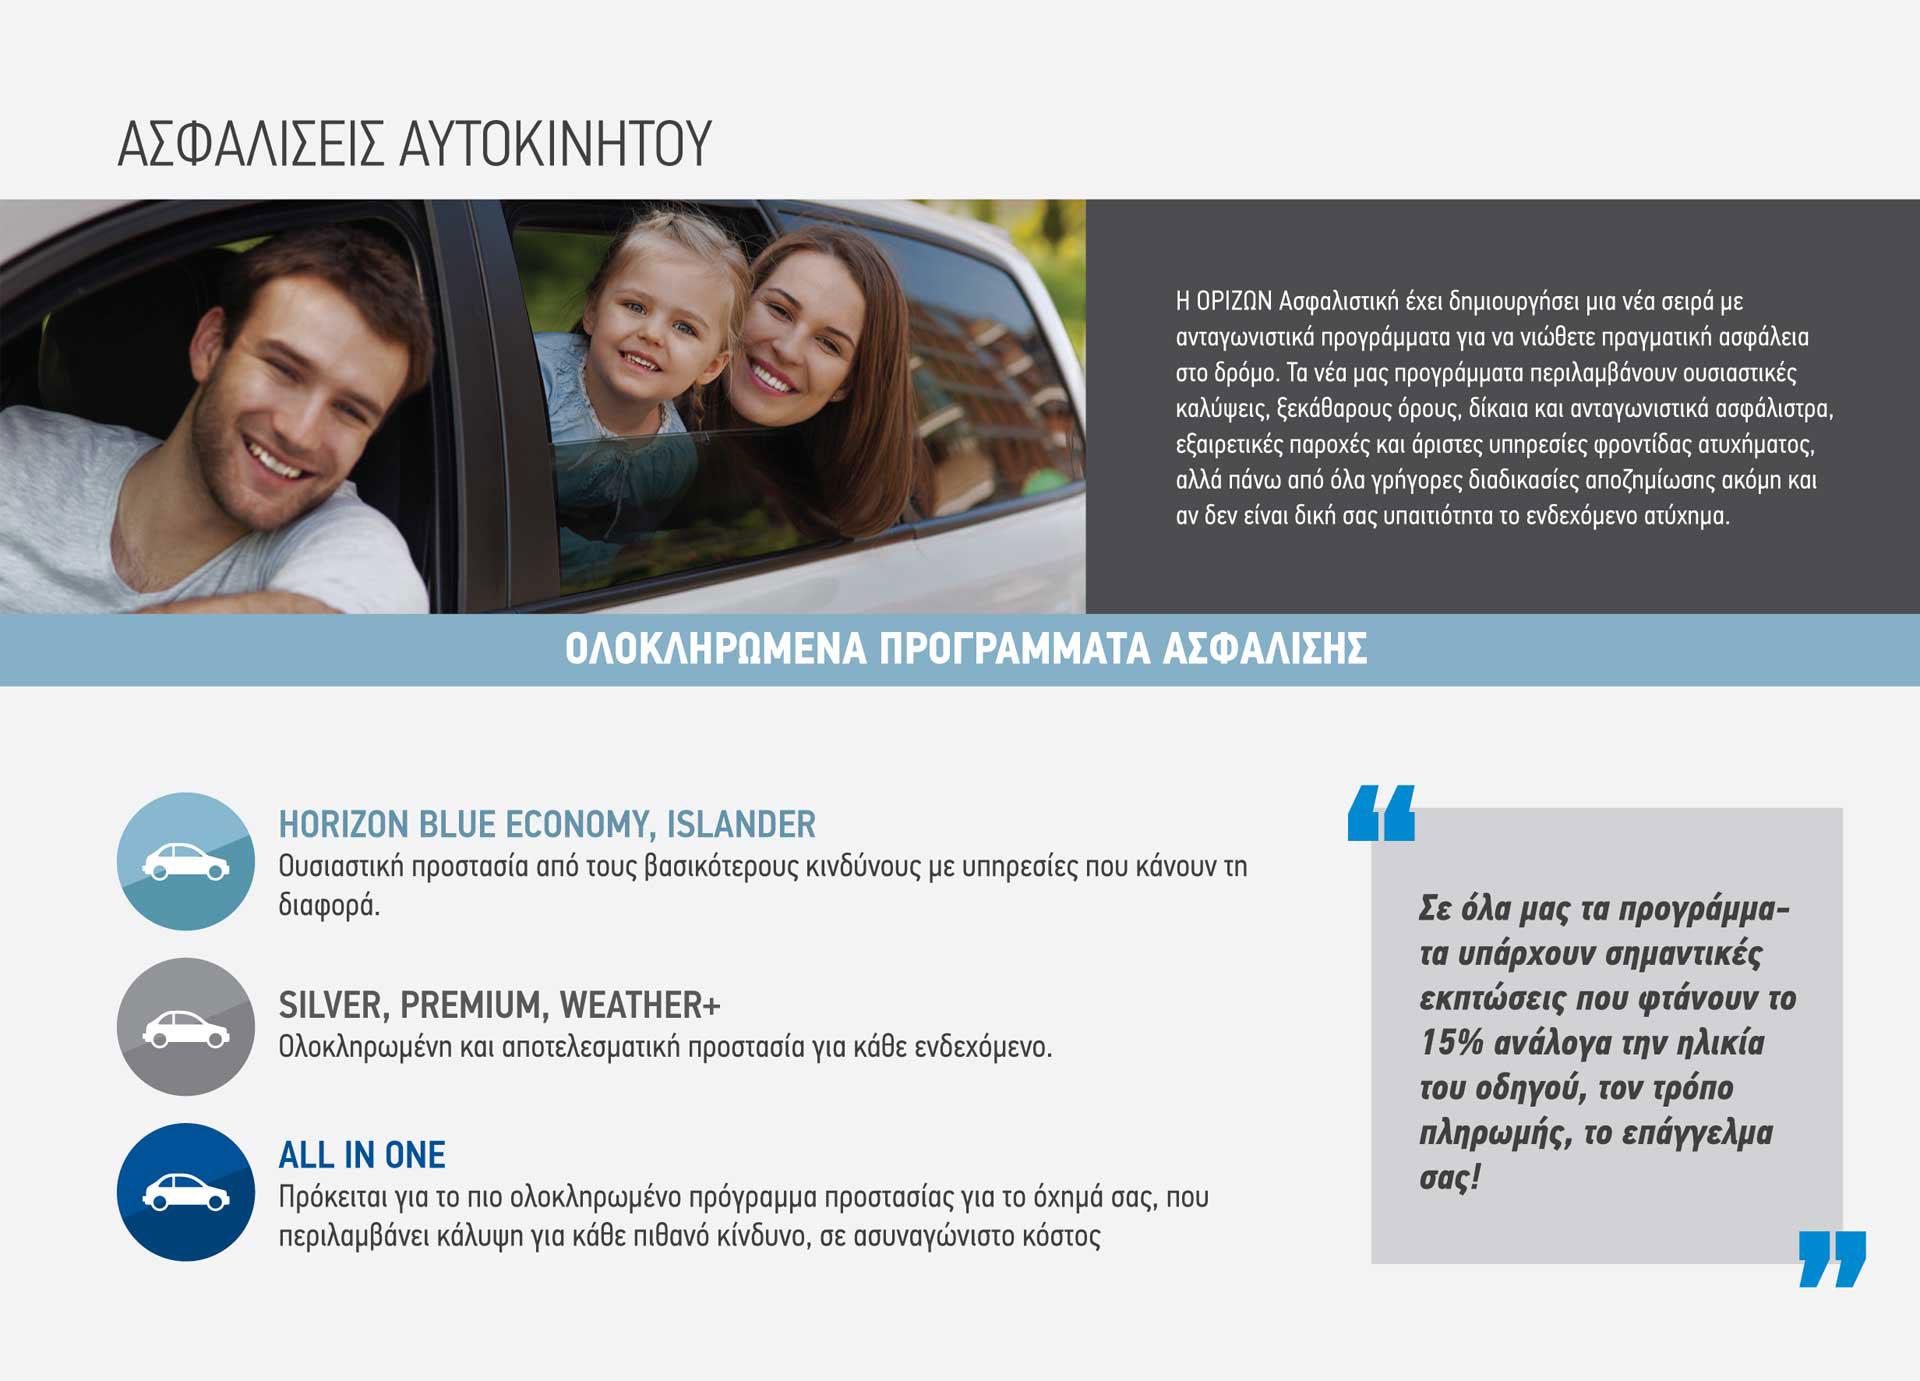 5cc5d5474978 ΓΕΝΙΚΟΙ   ΕΙΔΙΚΟΙ ΟΡΟΙ ΟΡΟΙ ΧΡΗΣΗΣ HORIZON APP - Μέσω της Mondial Assistance